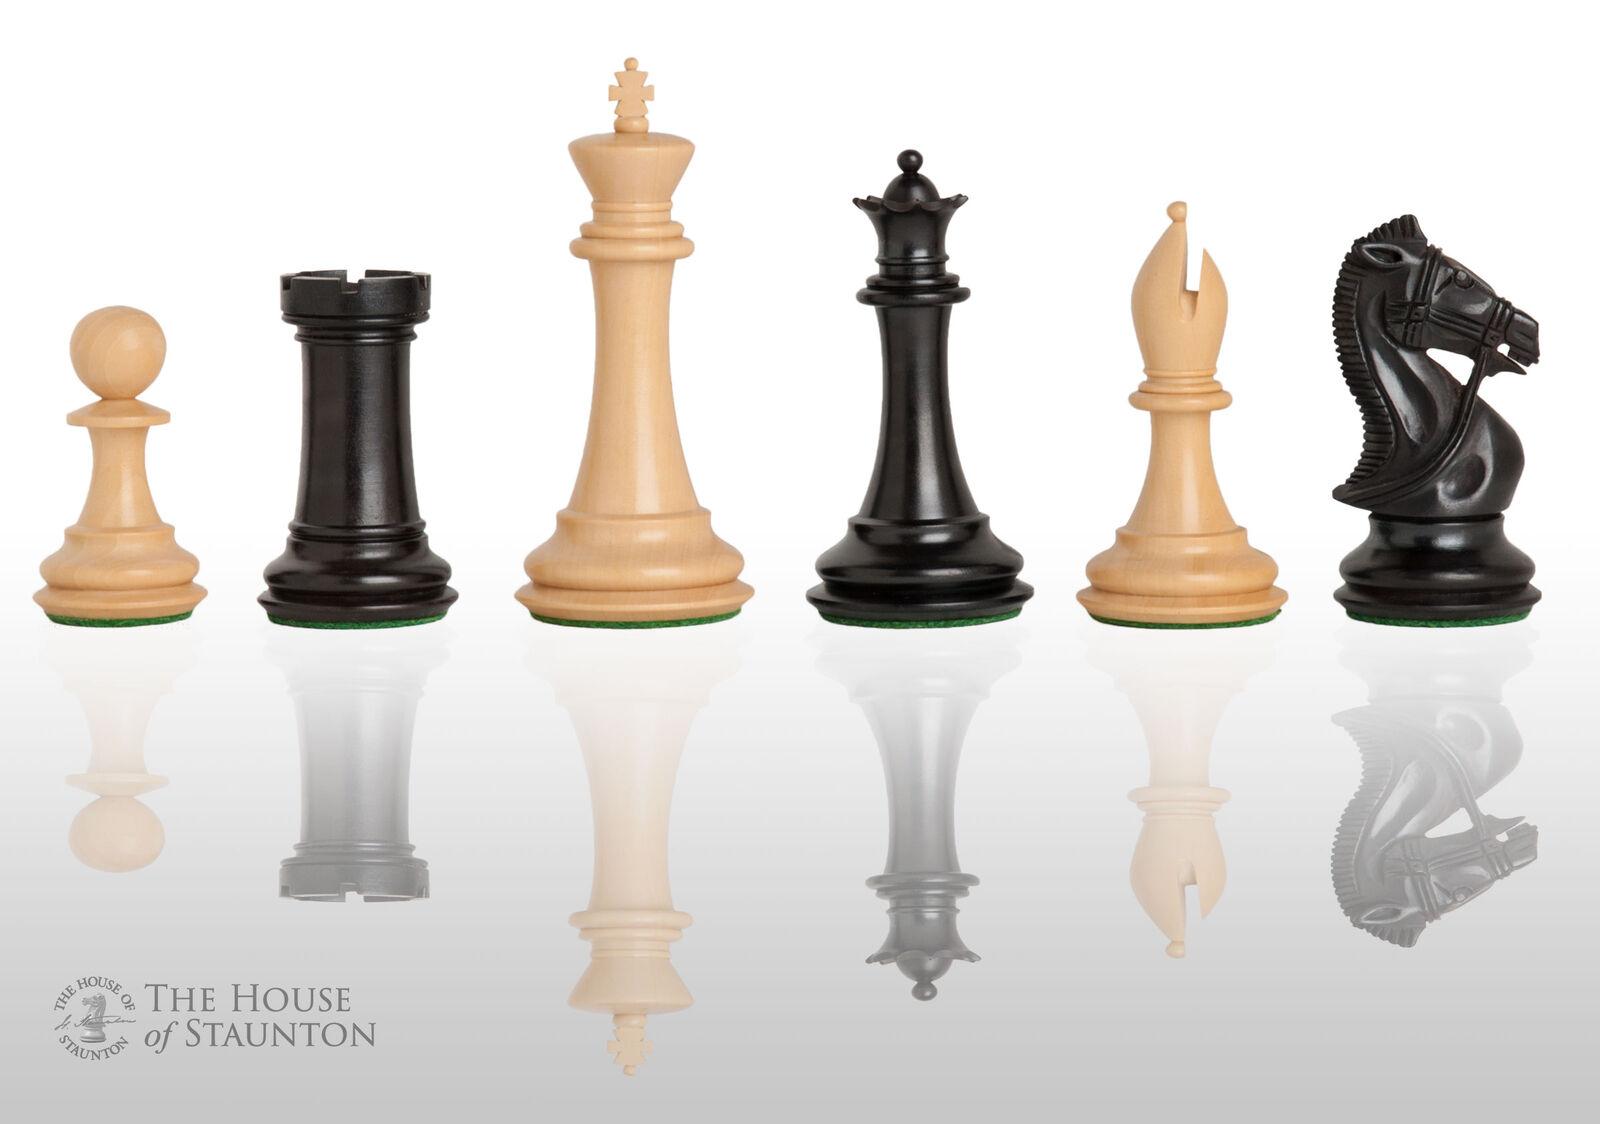 Les Leicester Chess Set-pièces seuleHommest - 4.0  King-ebonized Buis   magasin pas cher